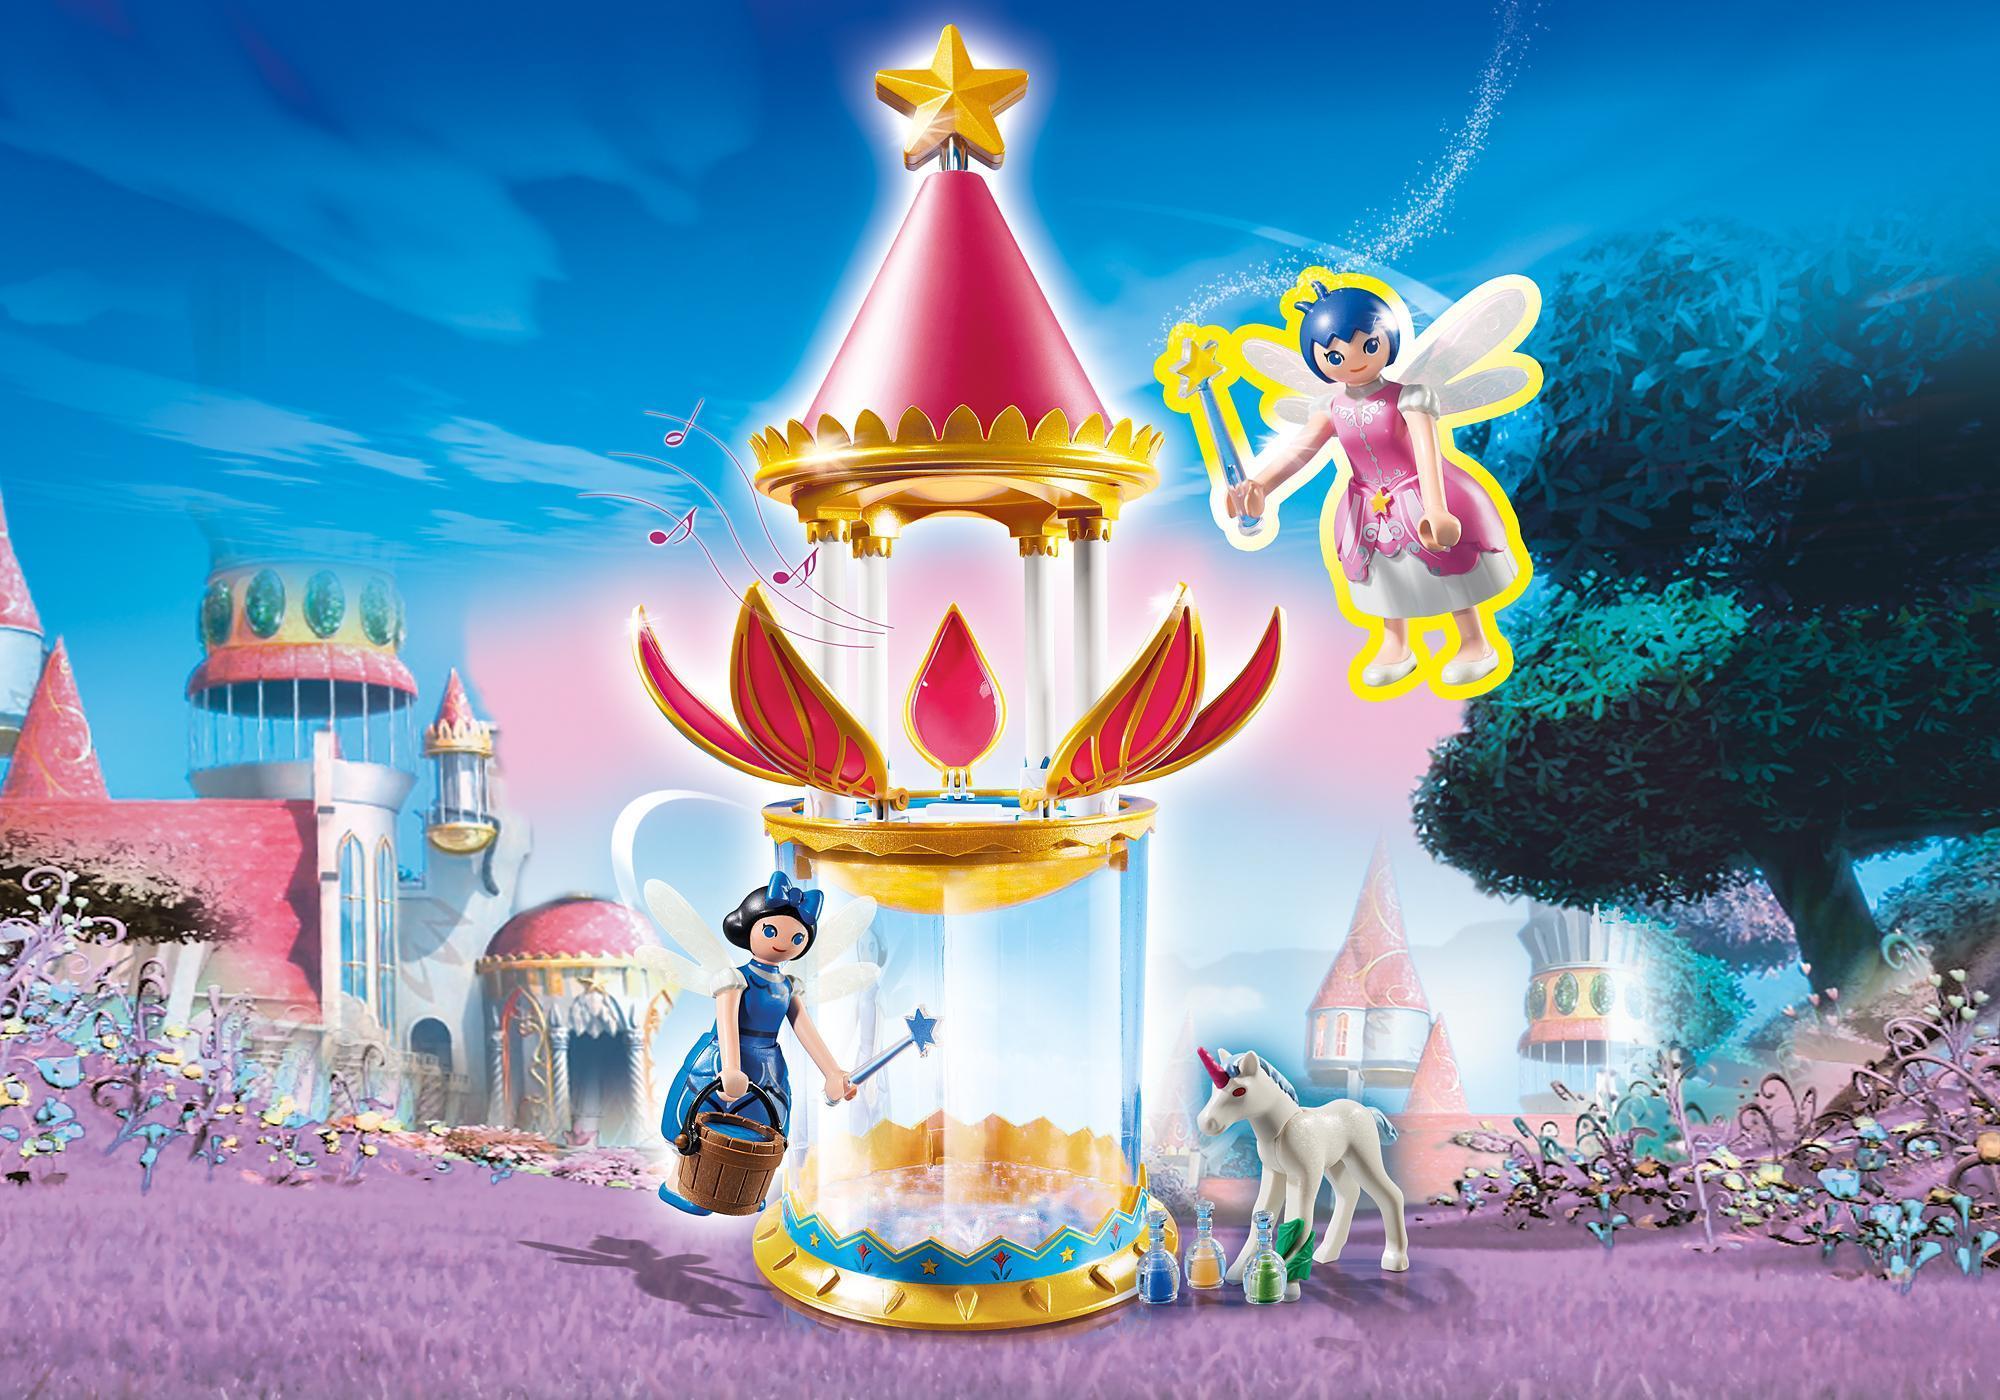 http://media.playmobil.com/i/playmobil/6688_product_detail/Музыкальные Цветочная Башня с Твинкл